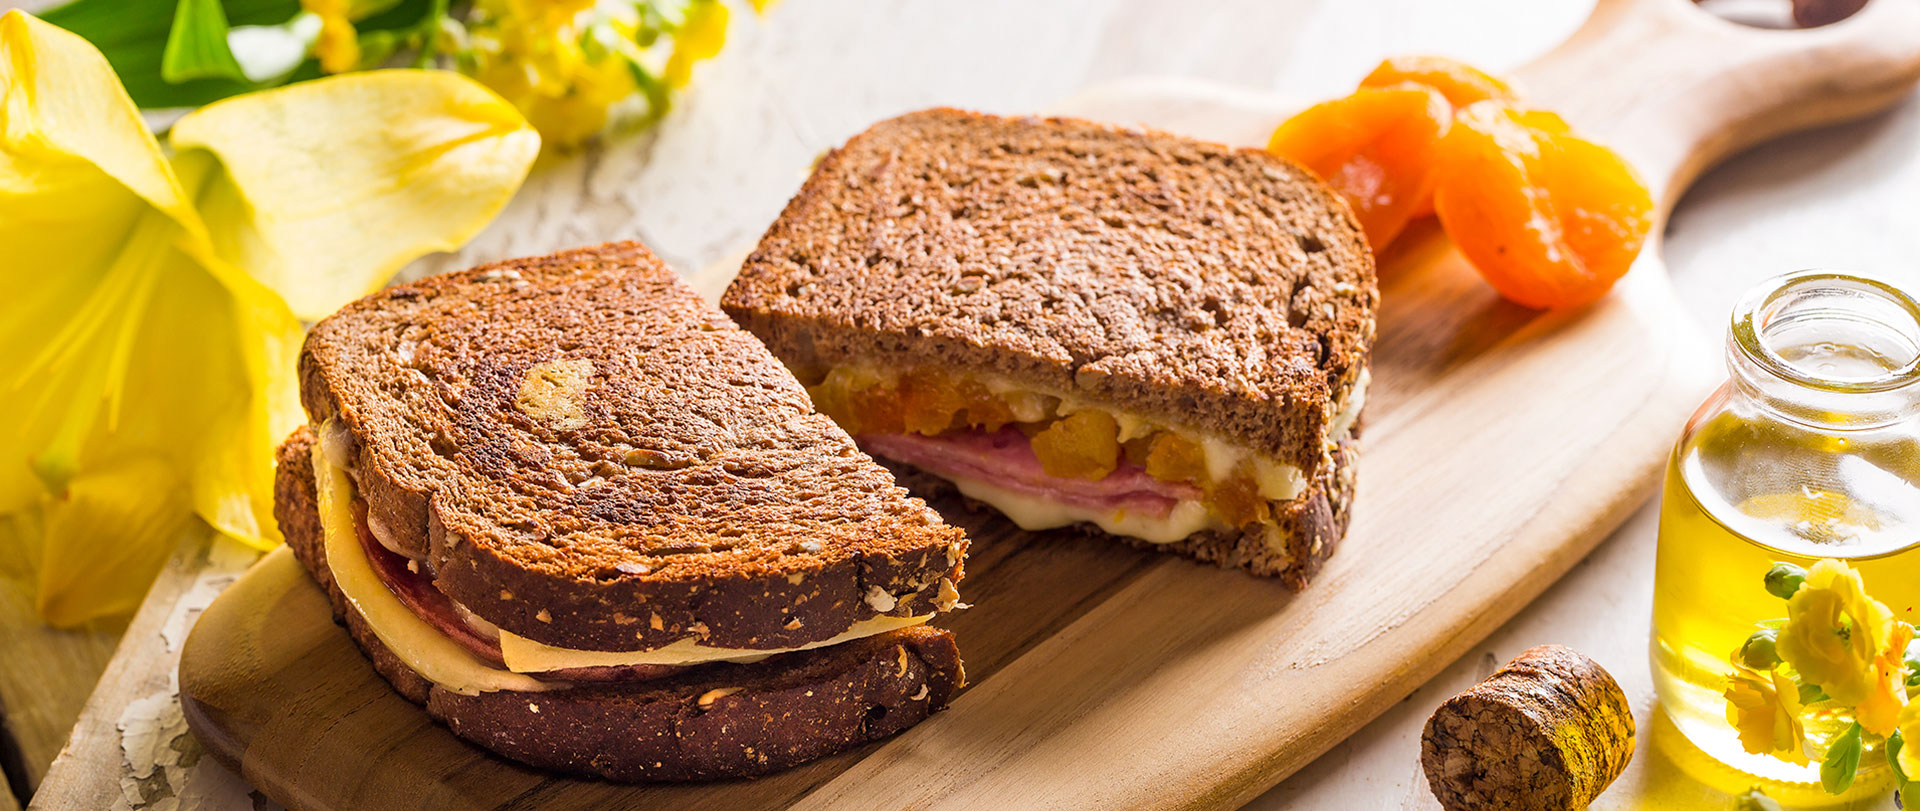 Tostex de queijo gruyere, lombo canadense e damasco